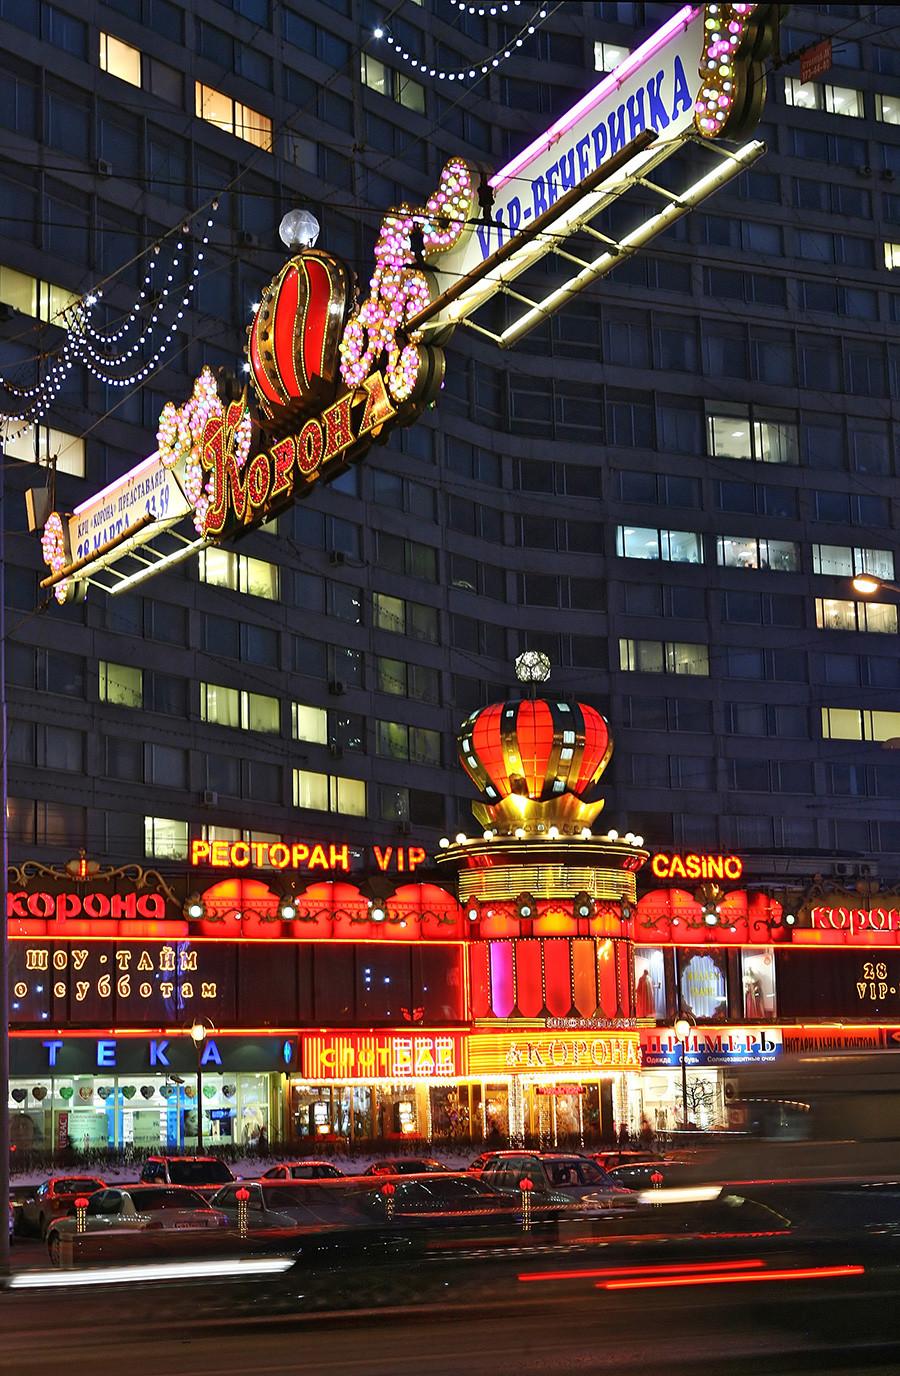 Casino in moscow wild horse casino hotel